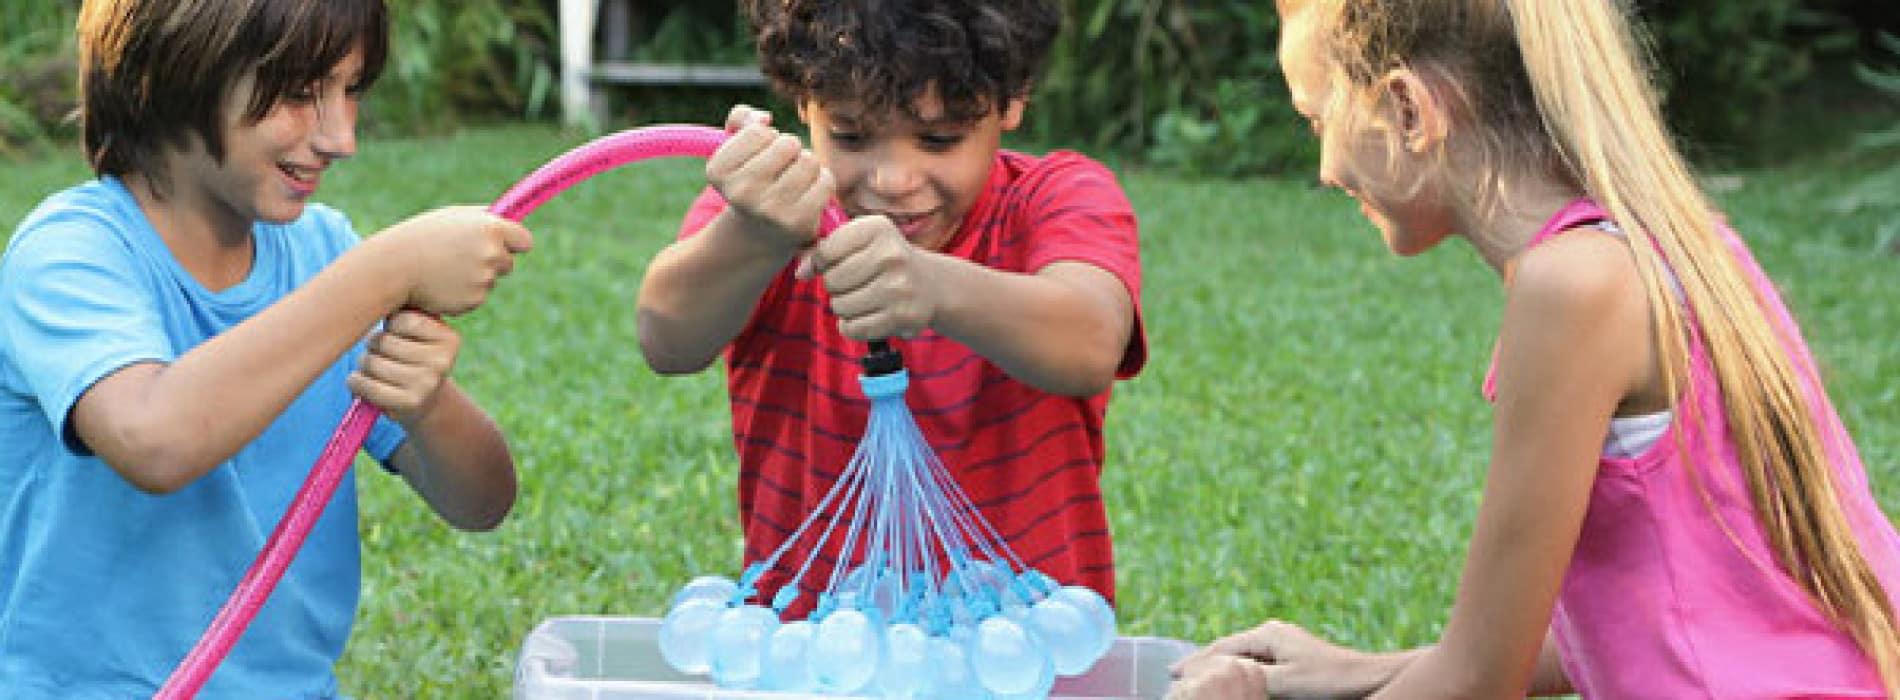 Bombes à eau : bunch o balloons